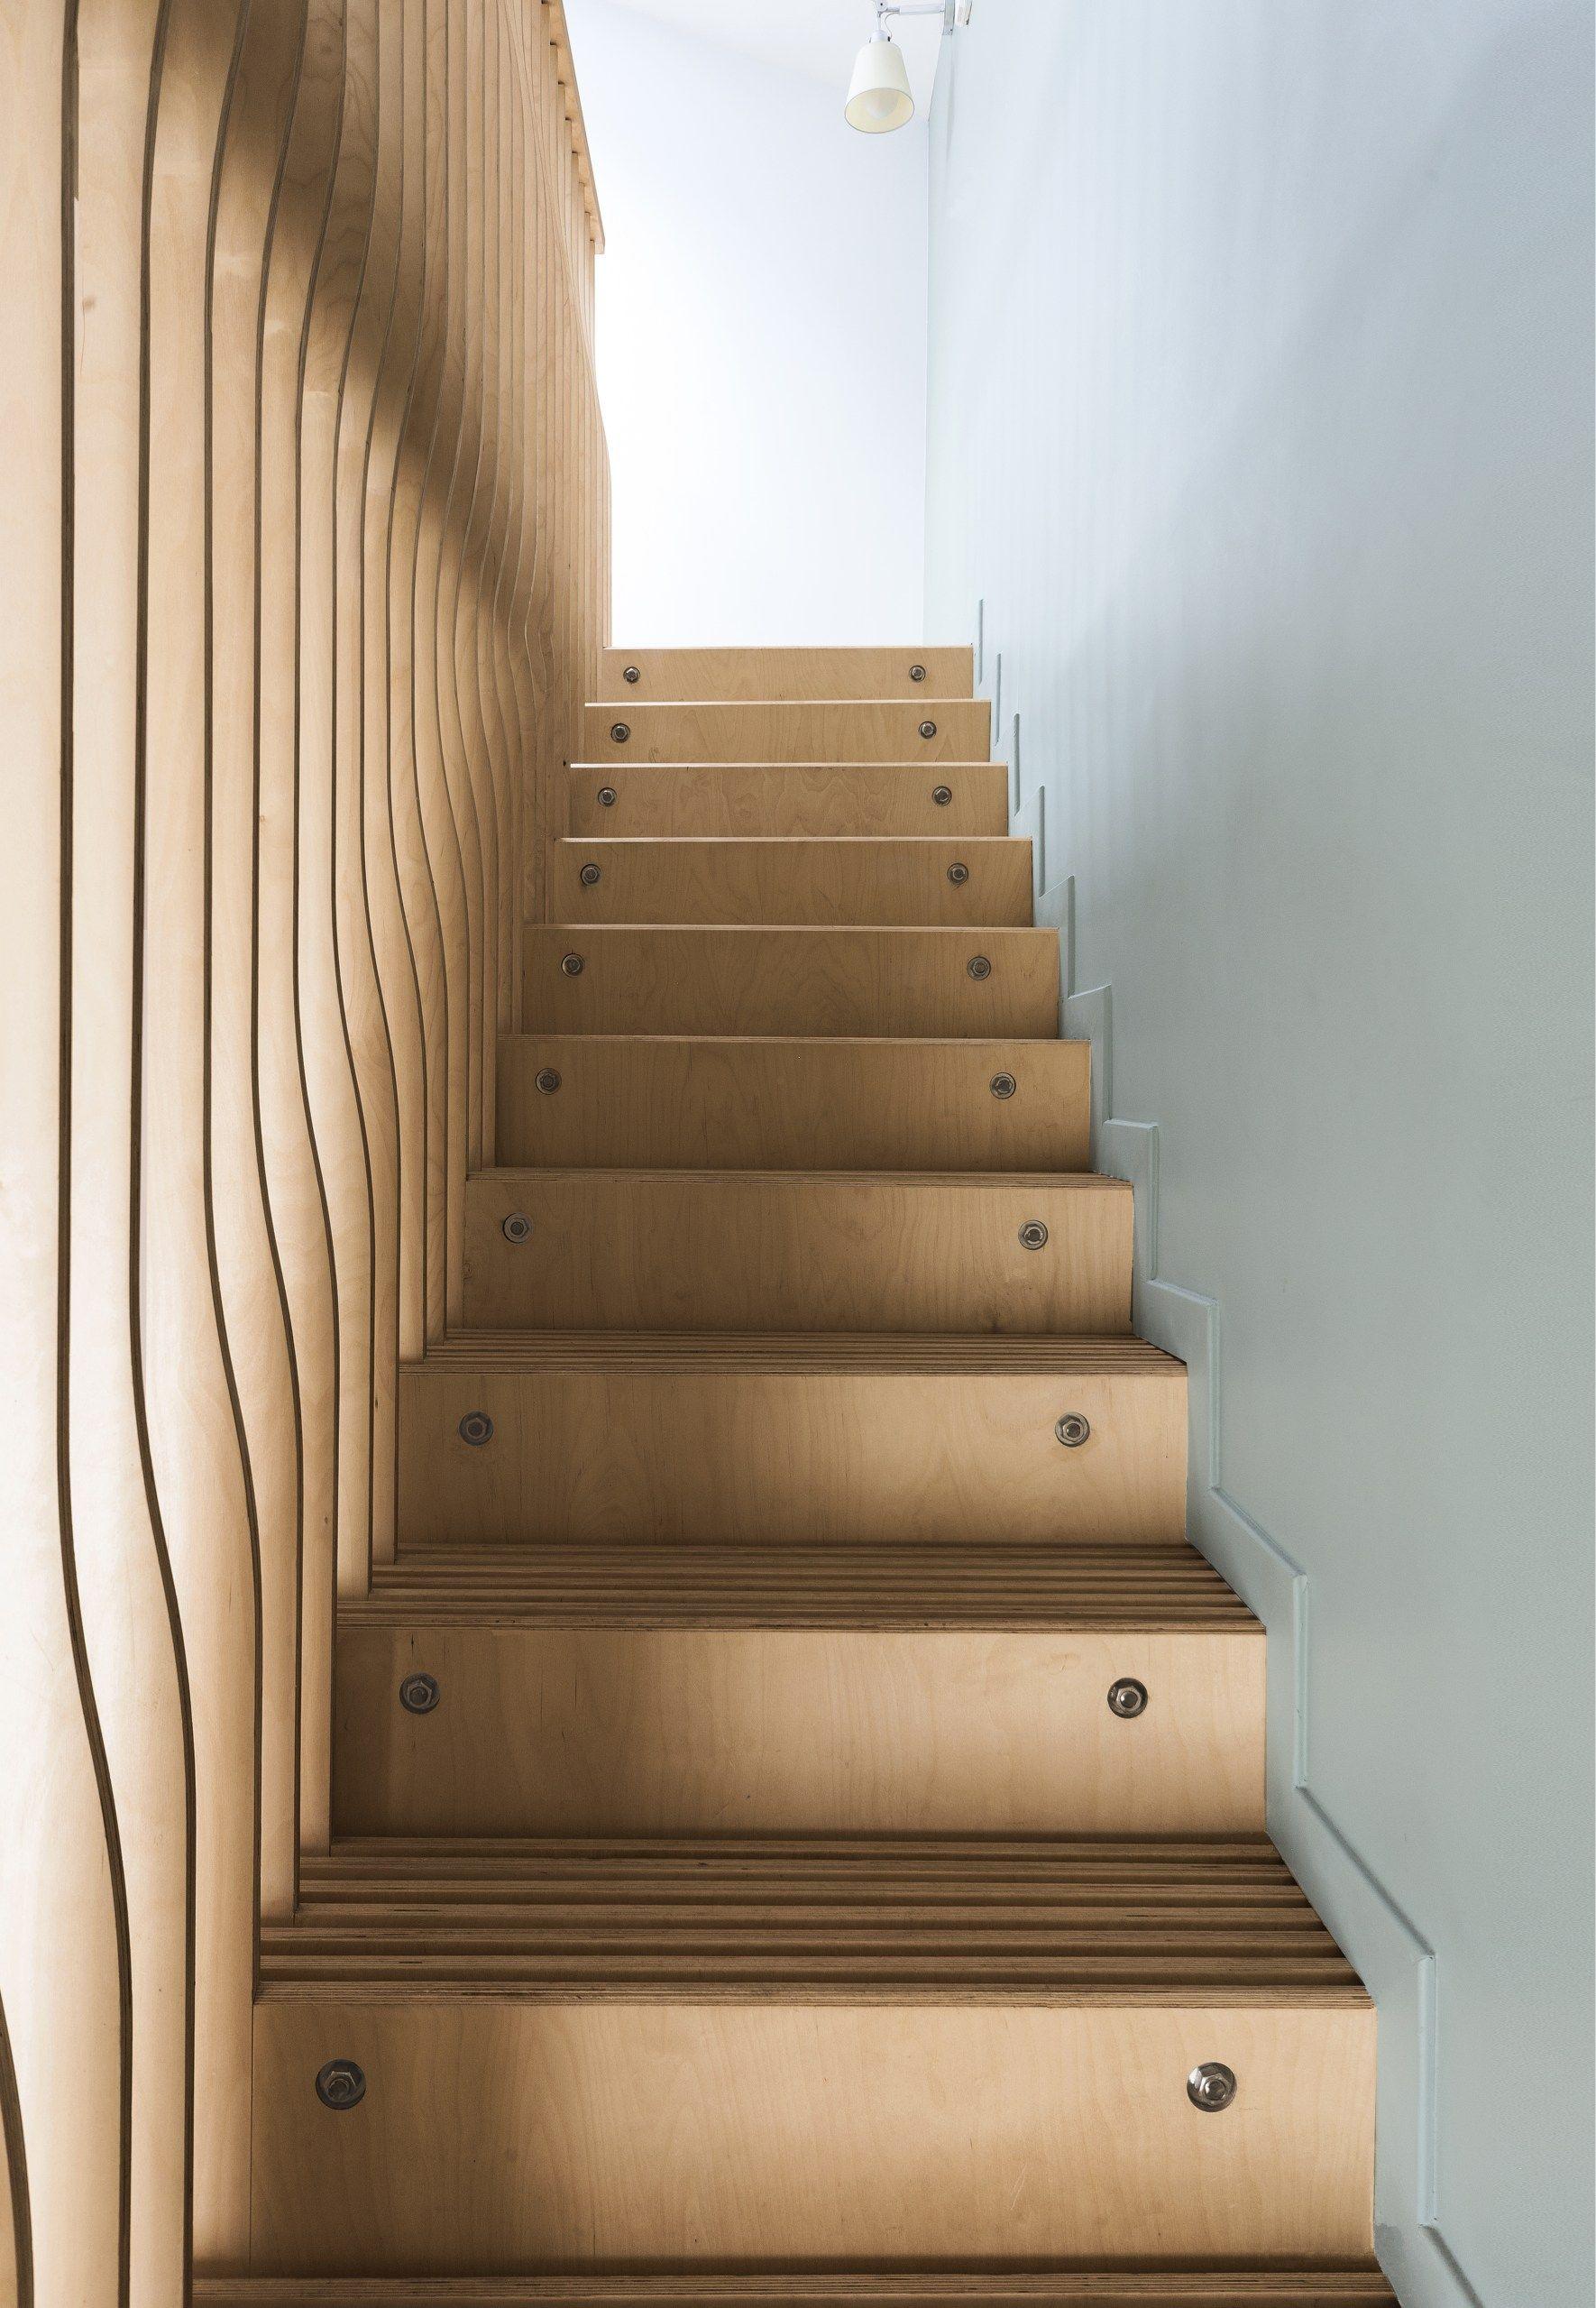 Creteil Escalier Escalier Rampe Escalier Maison